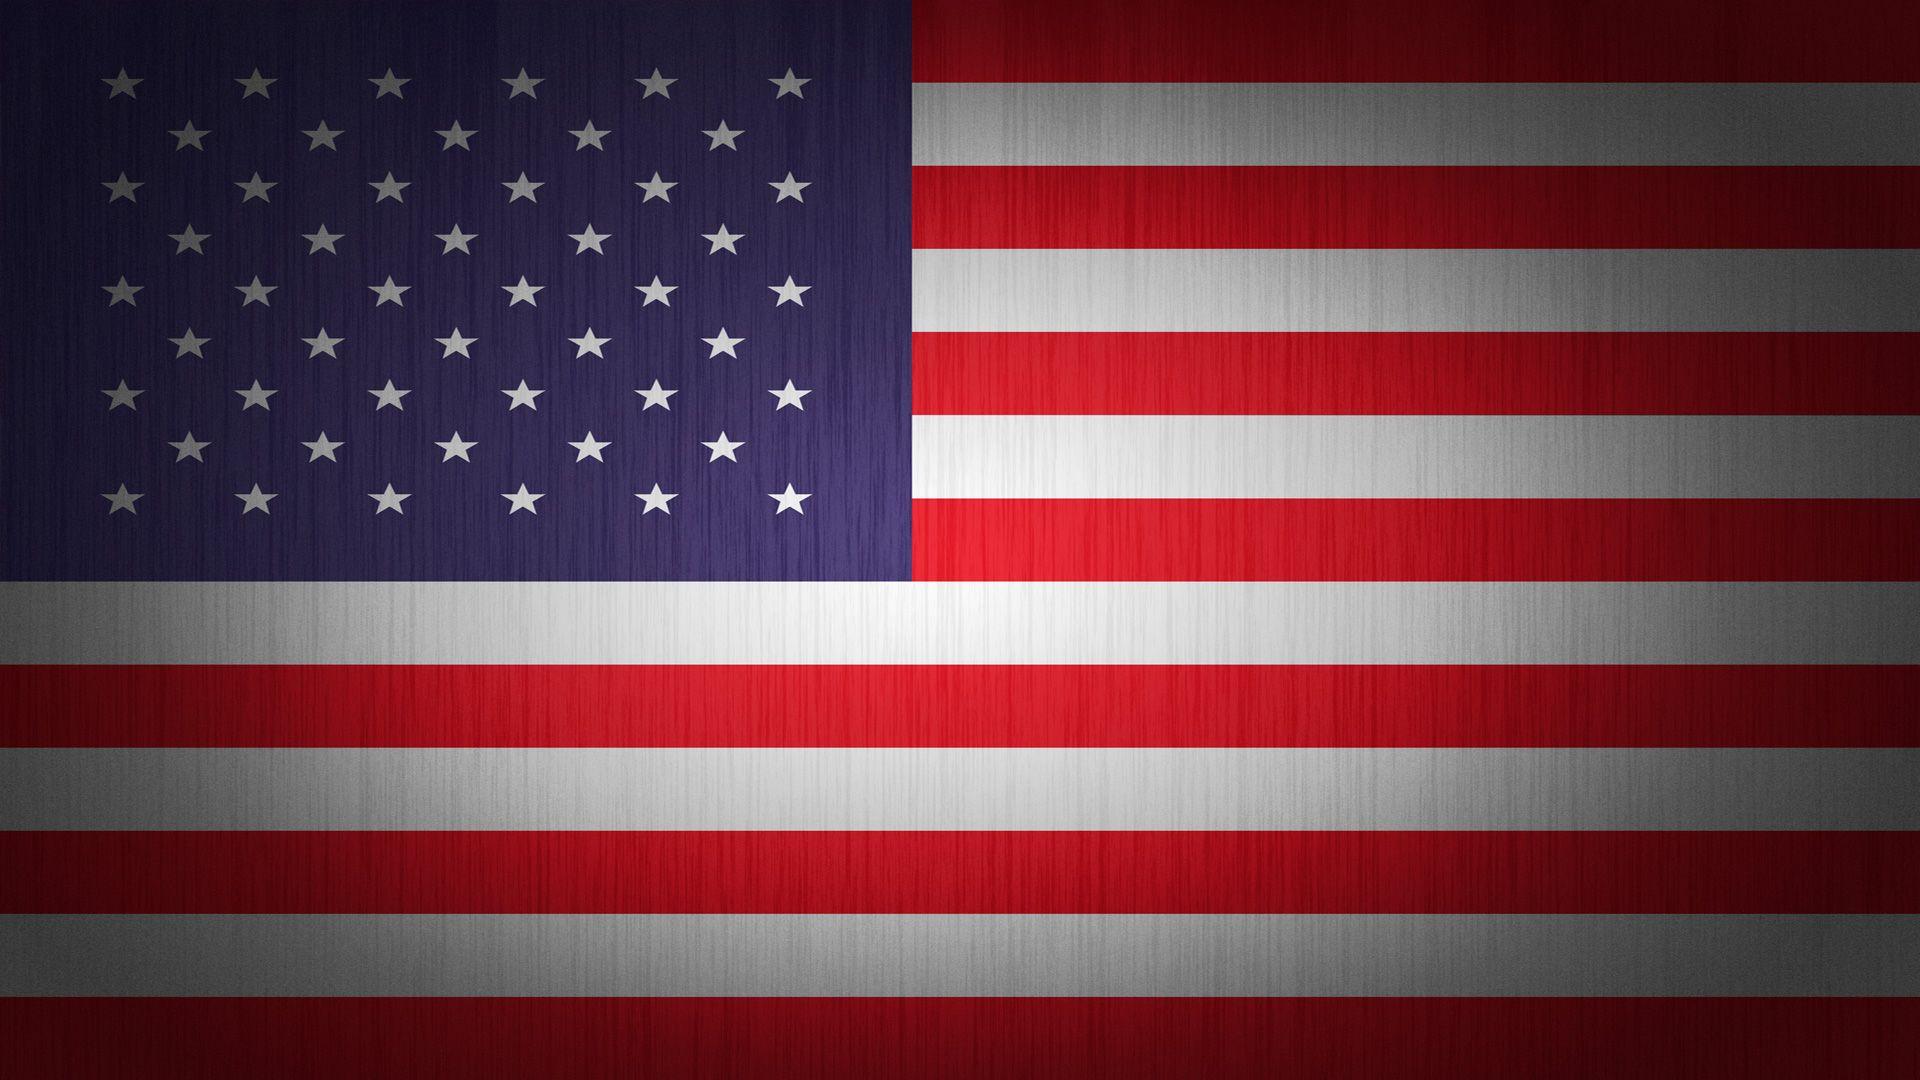 American Flag HD Wallpapers 1